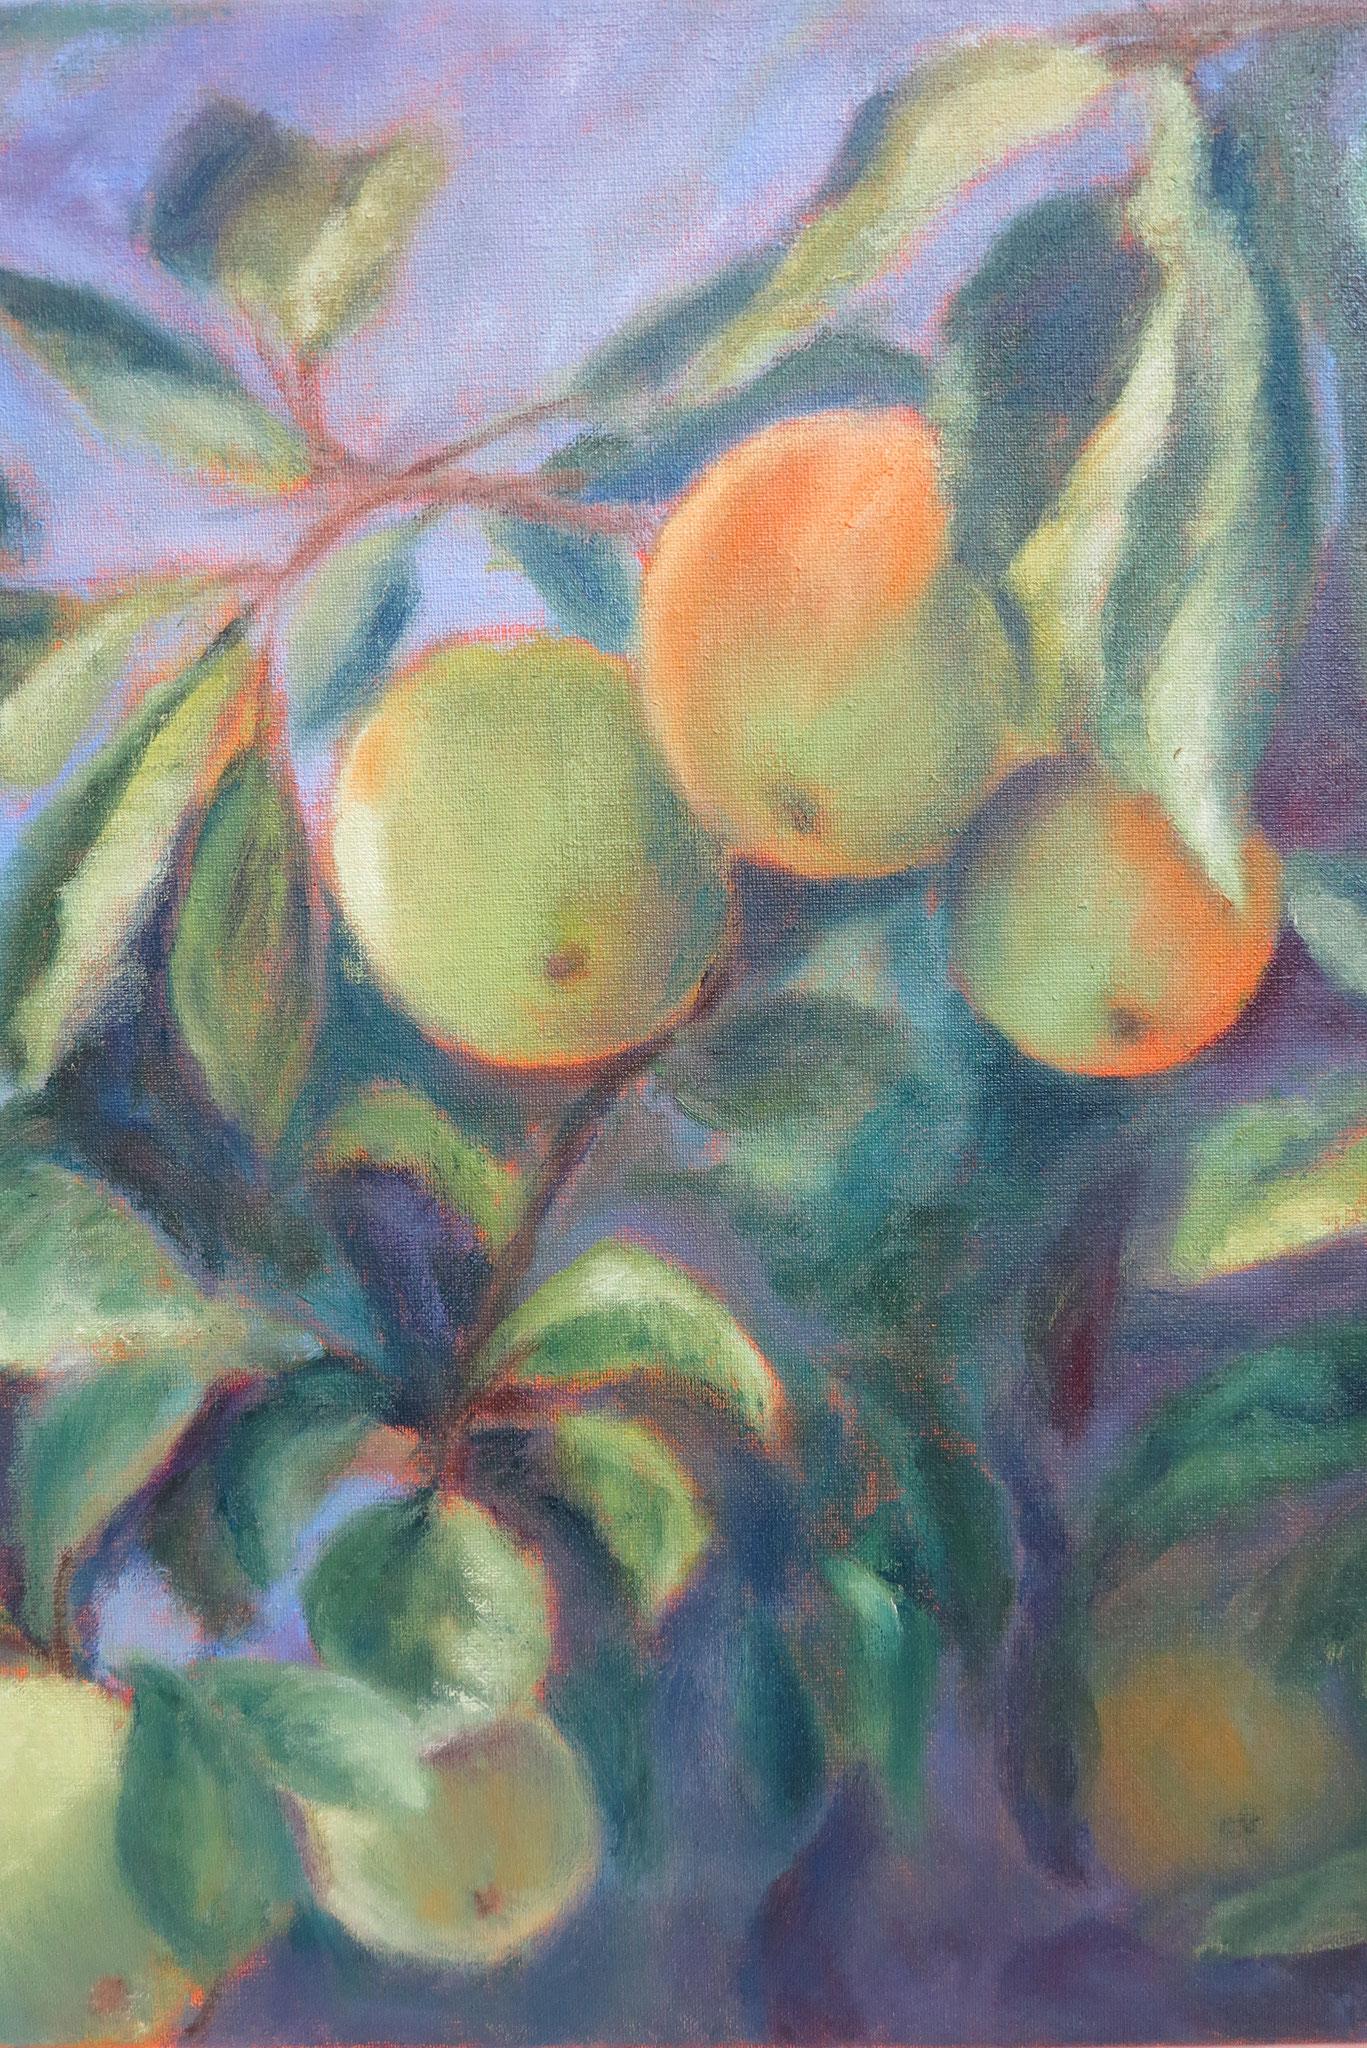 VERKOCHT appels in paars III. 40x50cm olie op linnen. 2019.